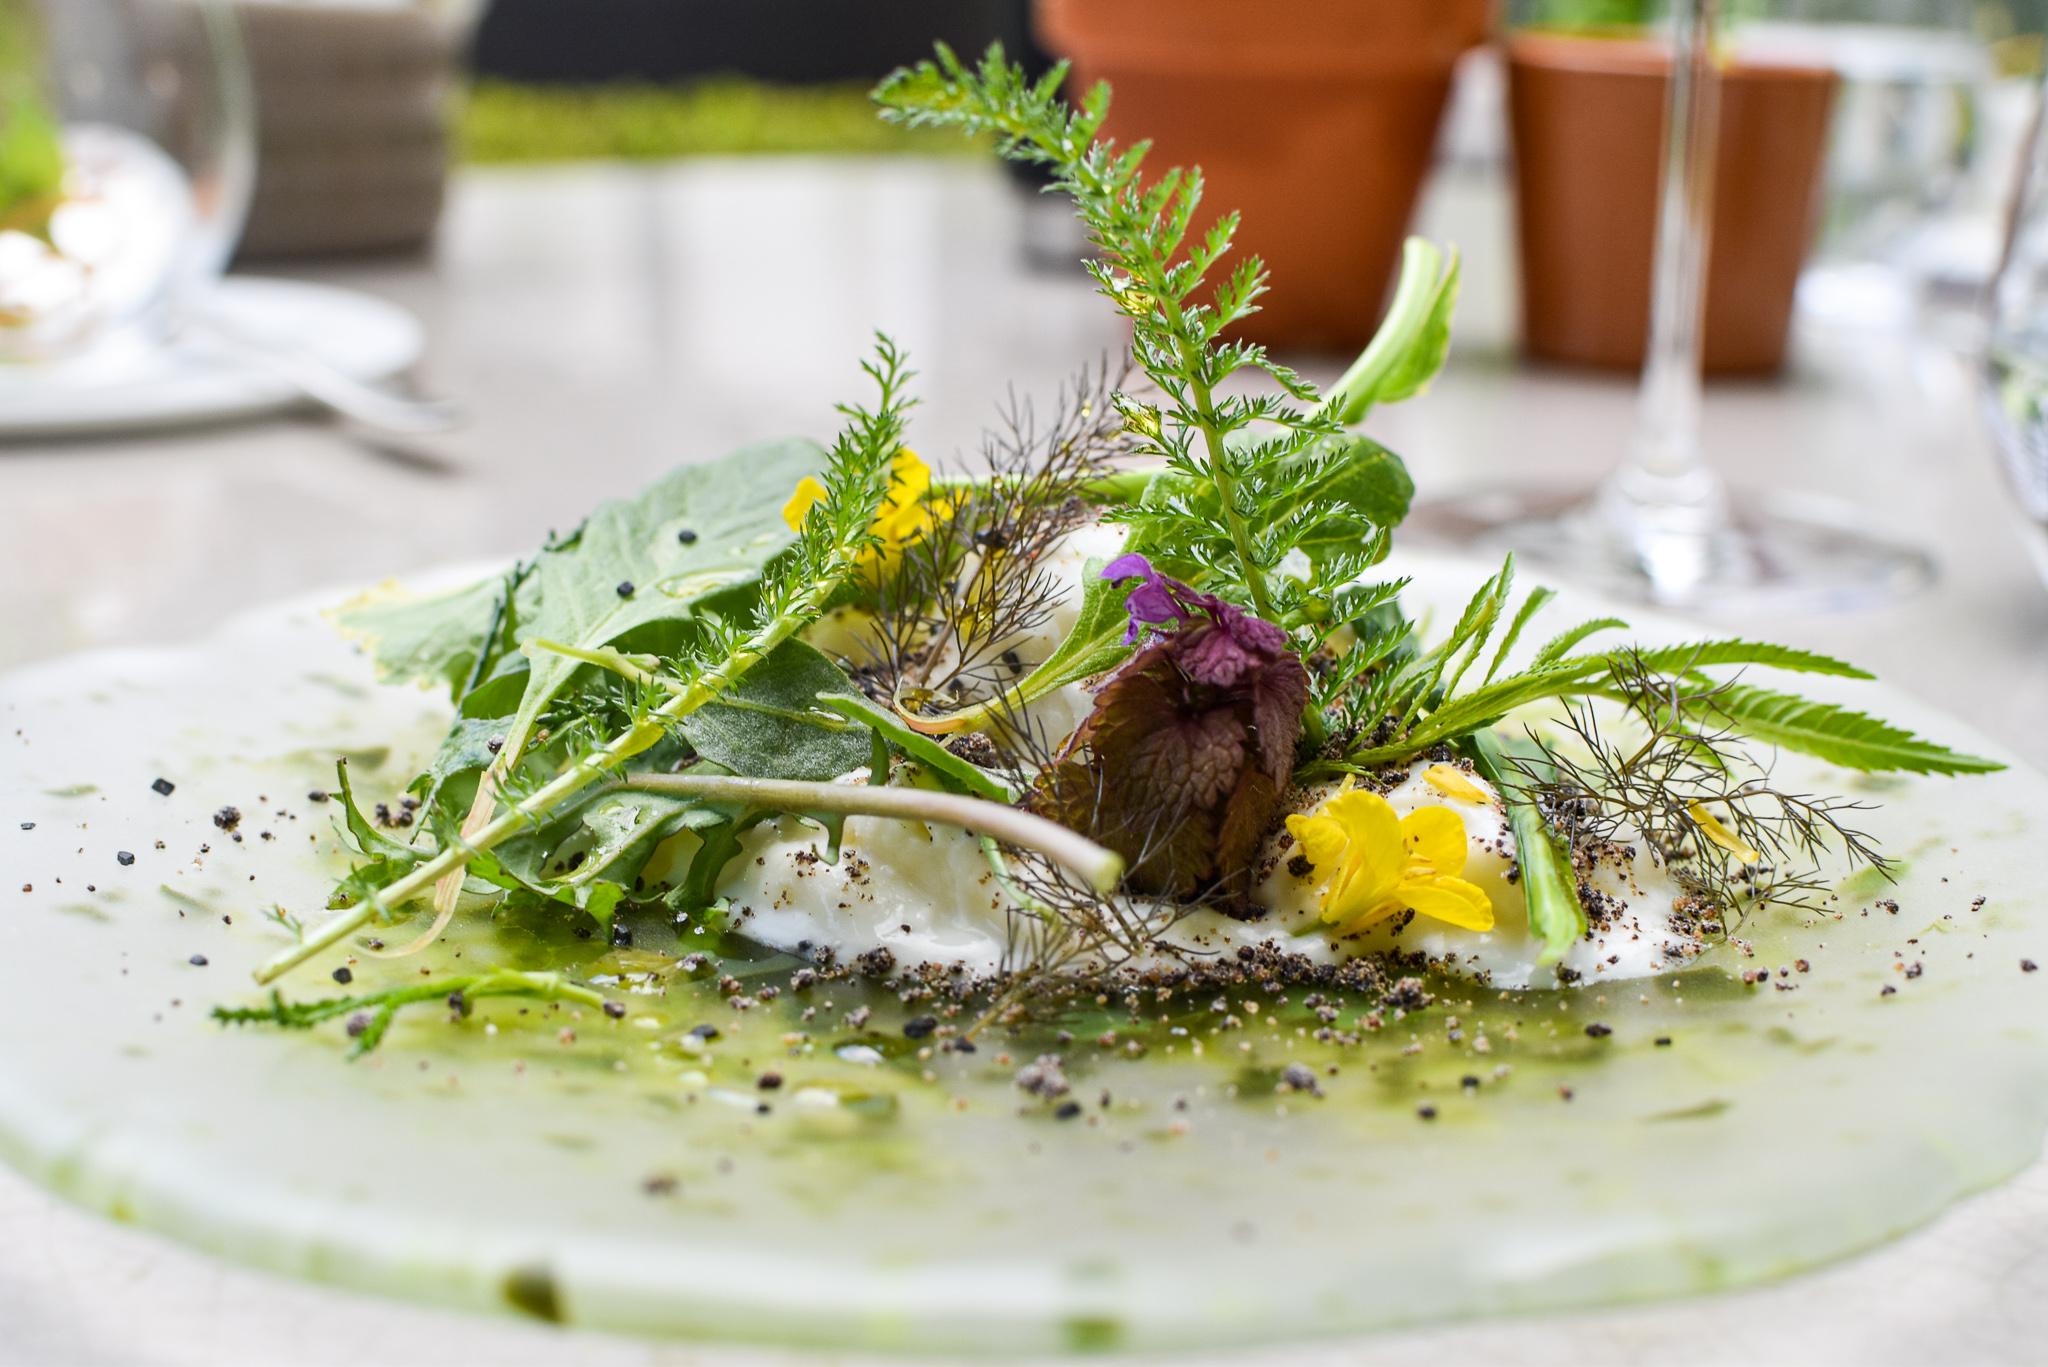 Boerderij en tuin - jonge groenten - tuinkruiden - zoute geitenmelksorbet